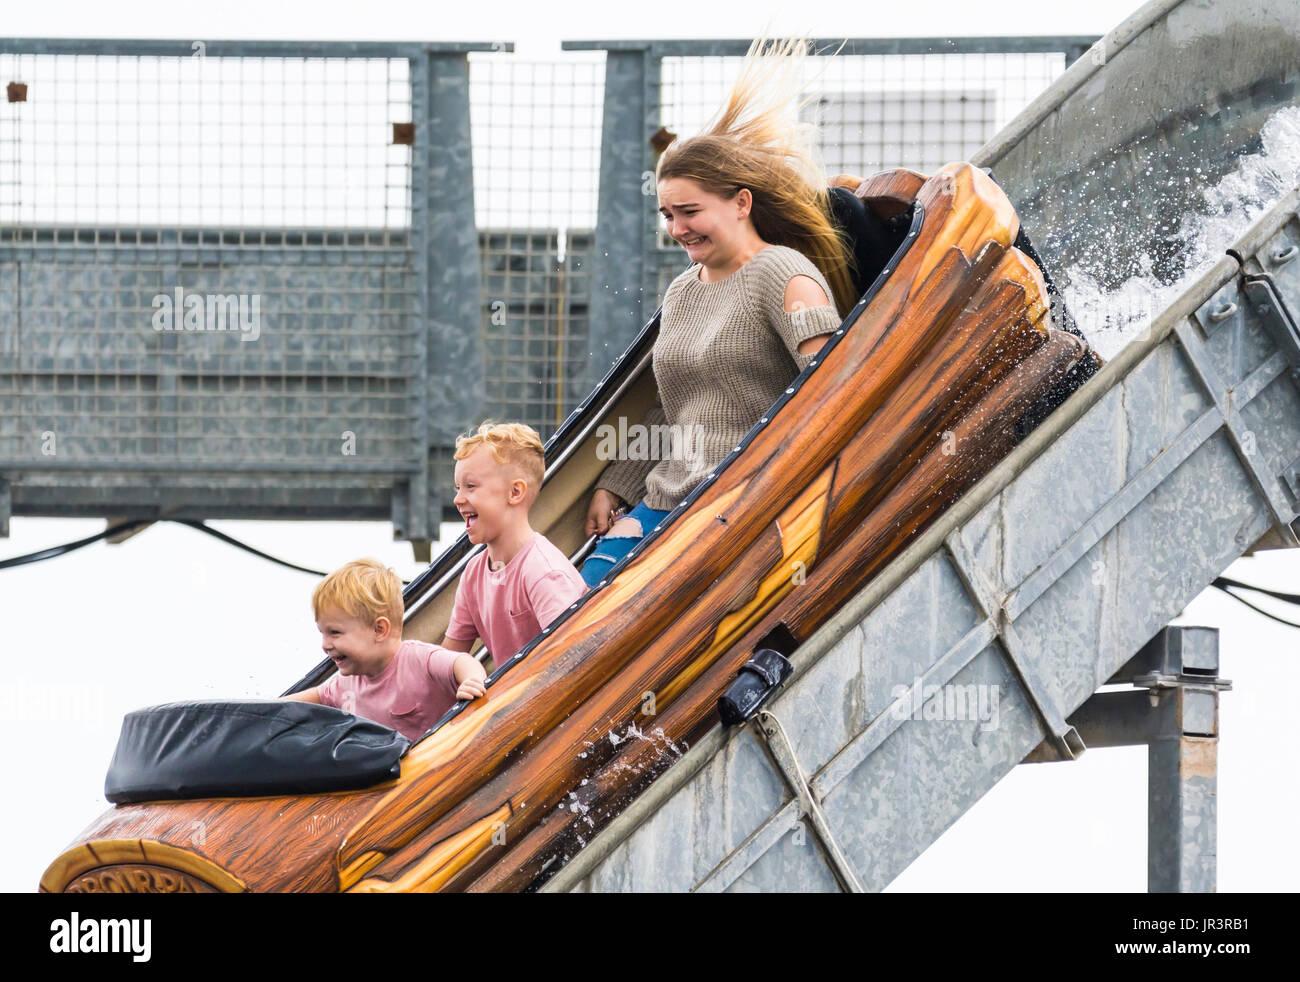 children-riding-on-a-long-flume-water-ride-in-summer-at-an-amusement-JR3RB1.jpg